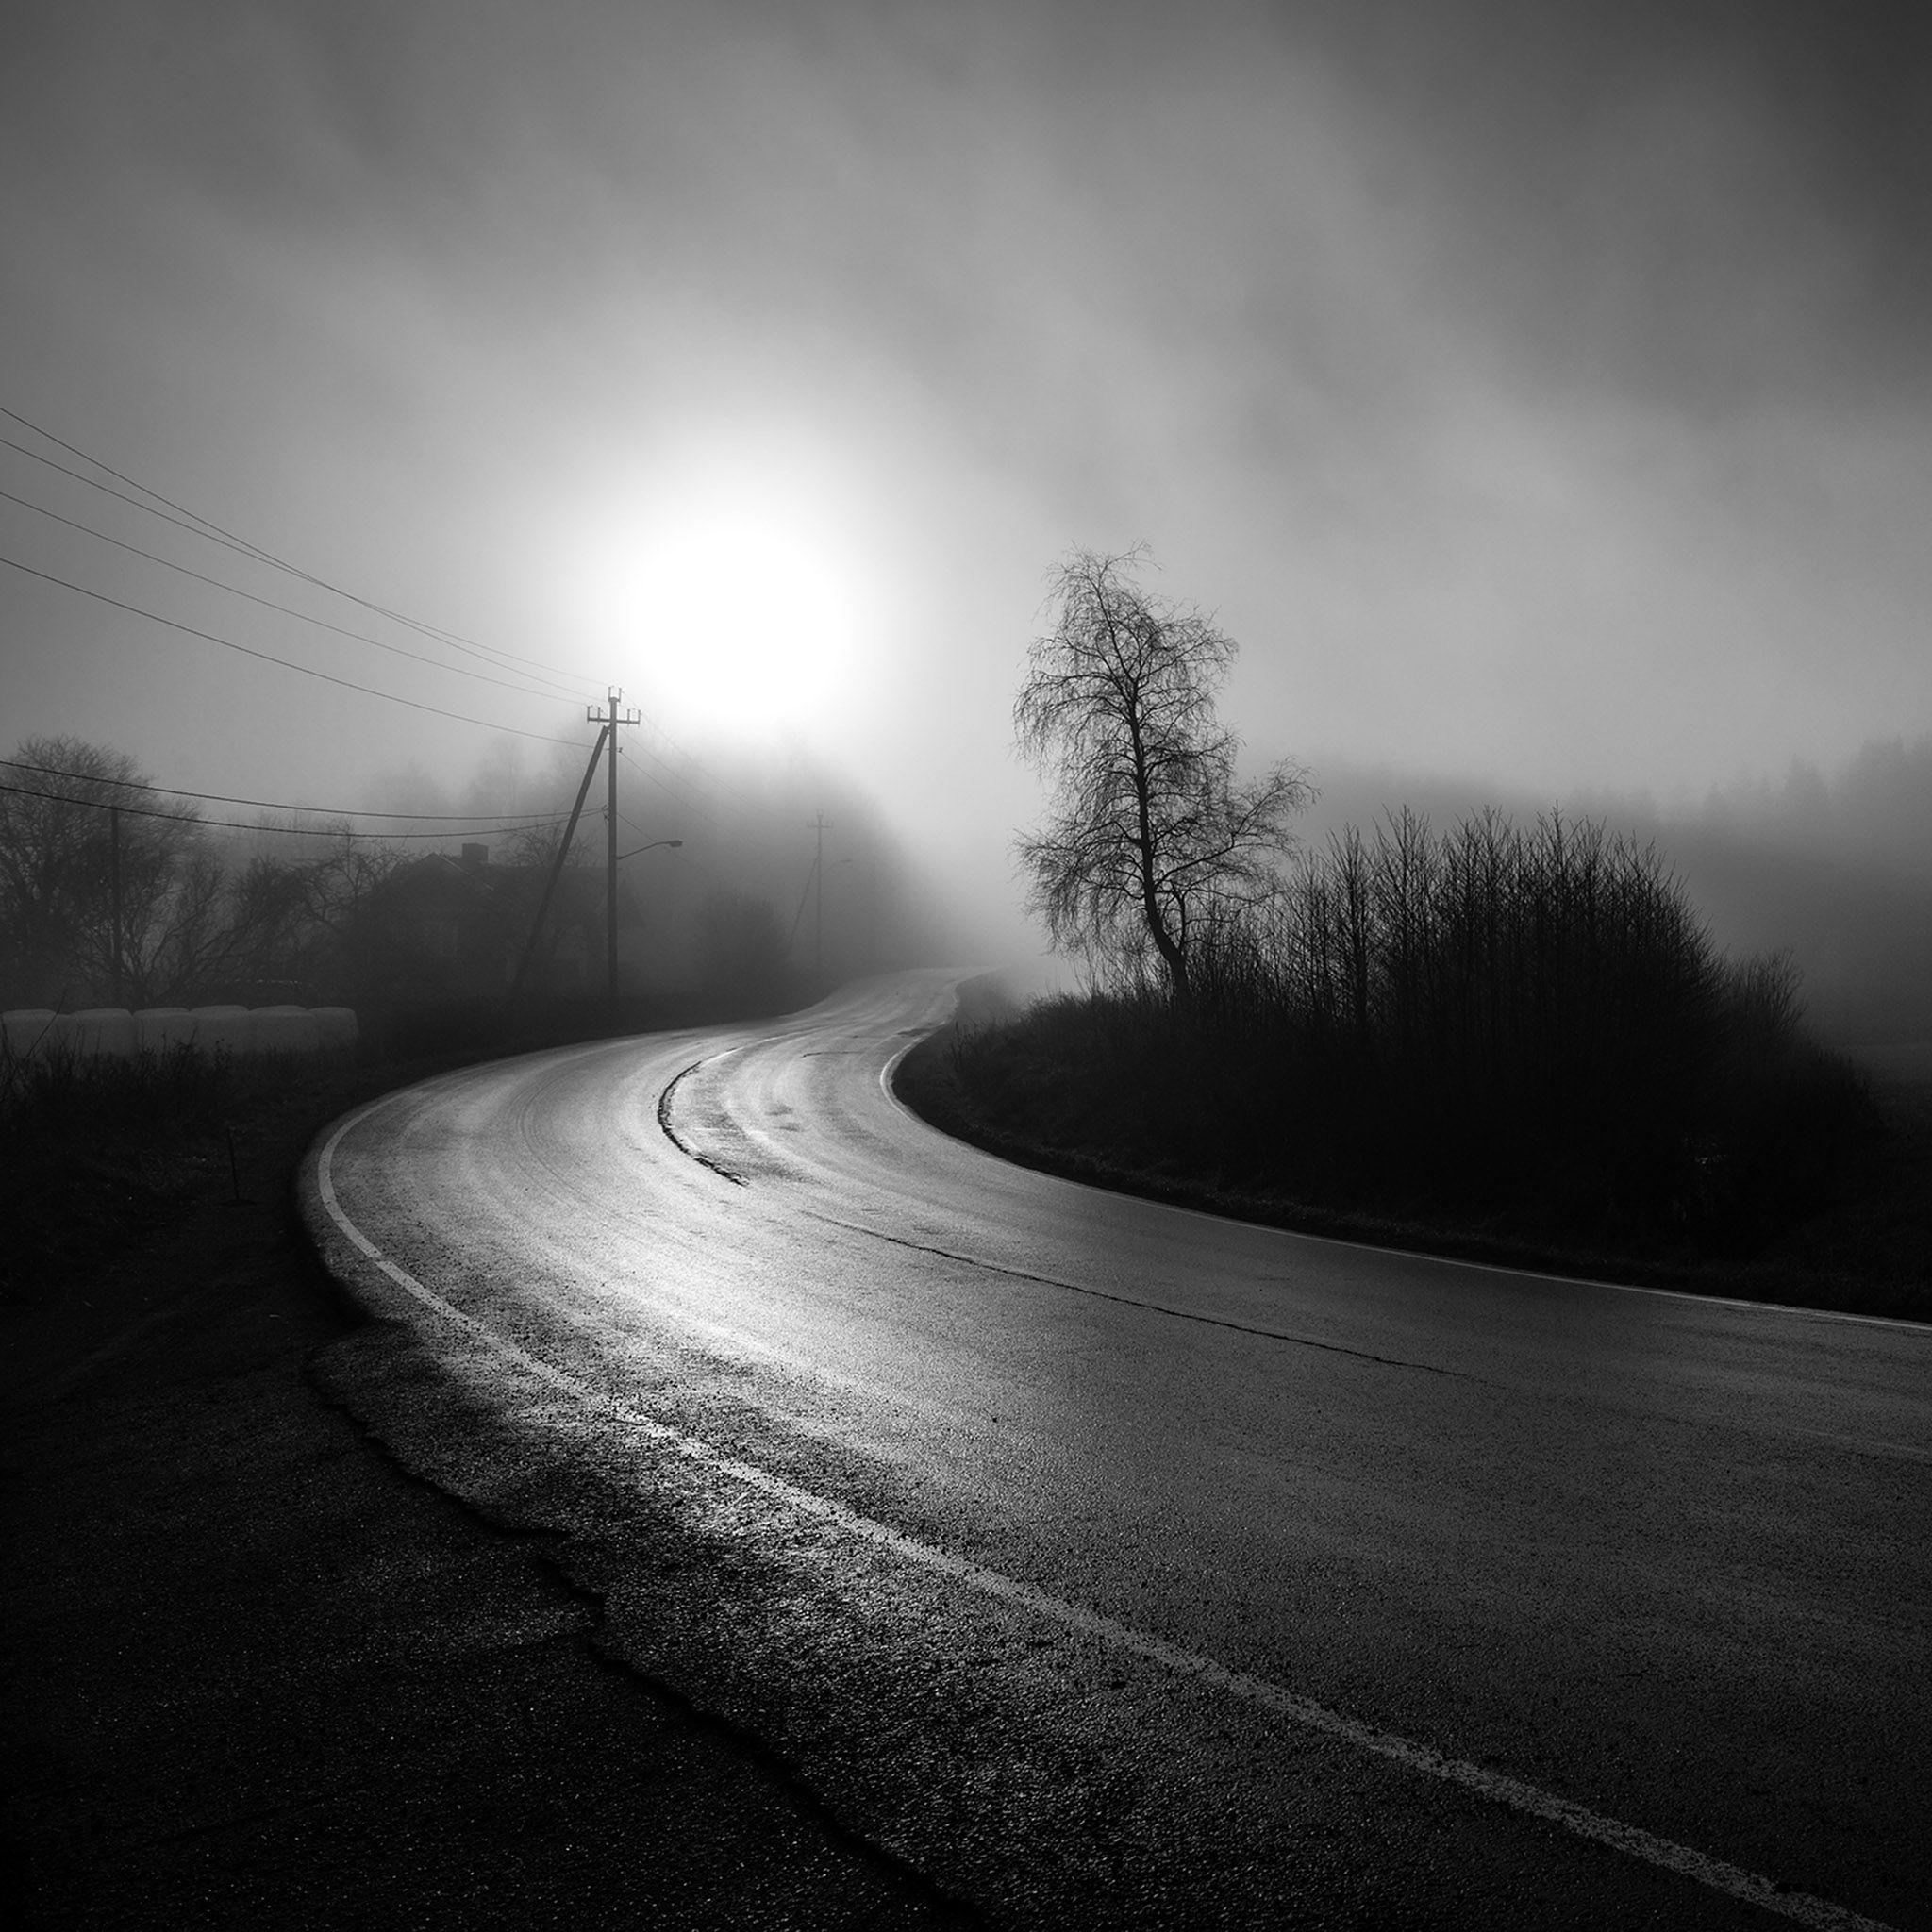 Download Dark Foggy Country Road IPad Wallpaper HD